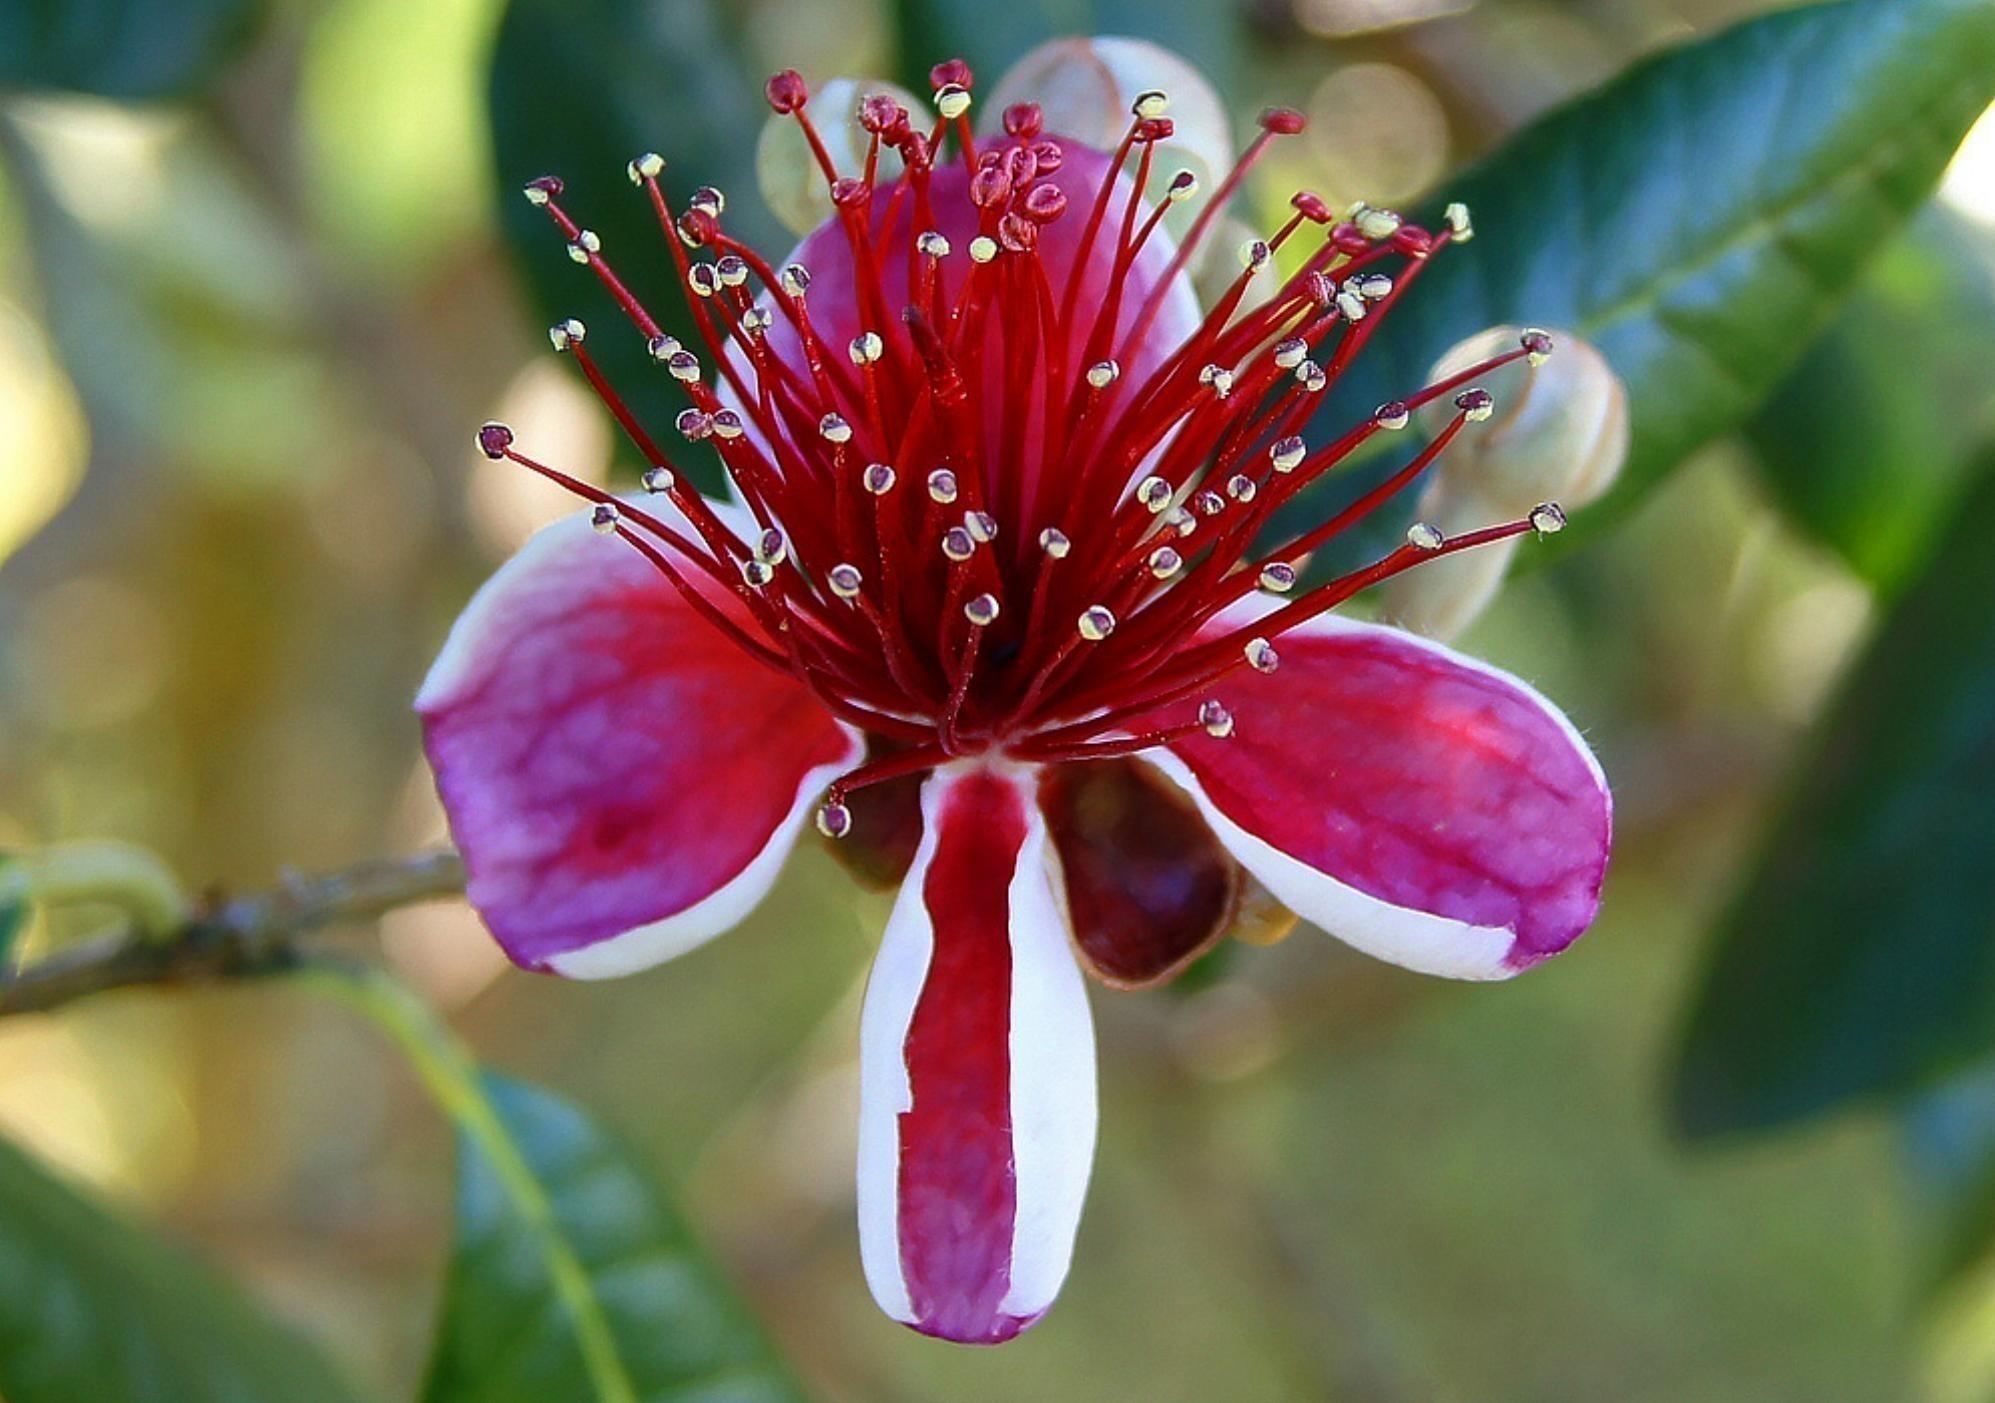 Semillas de manzana azul de australia billardiera longiflora for Semillas de cactus chile